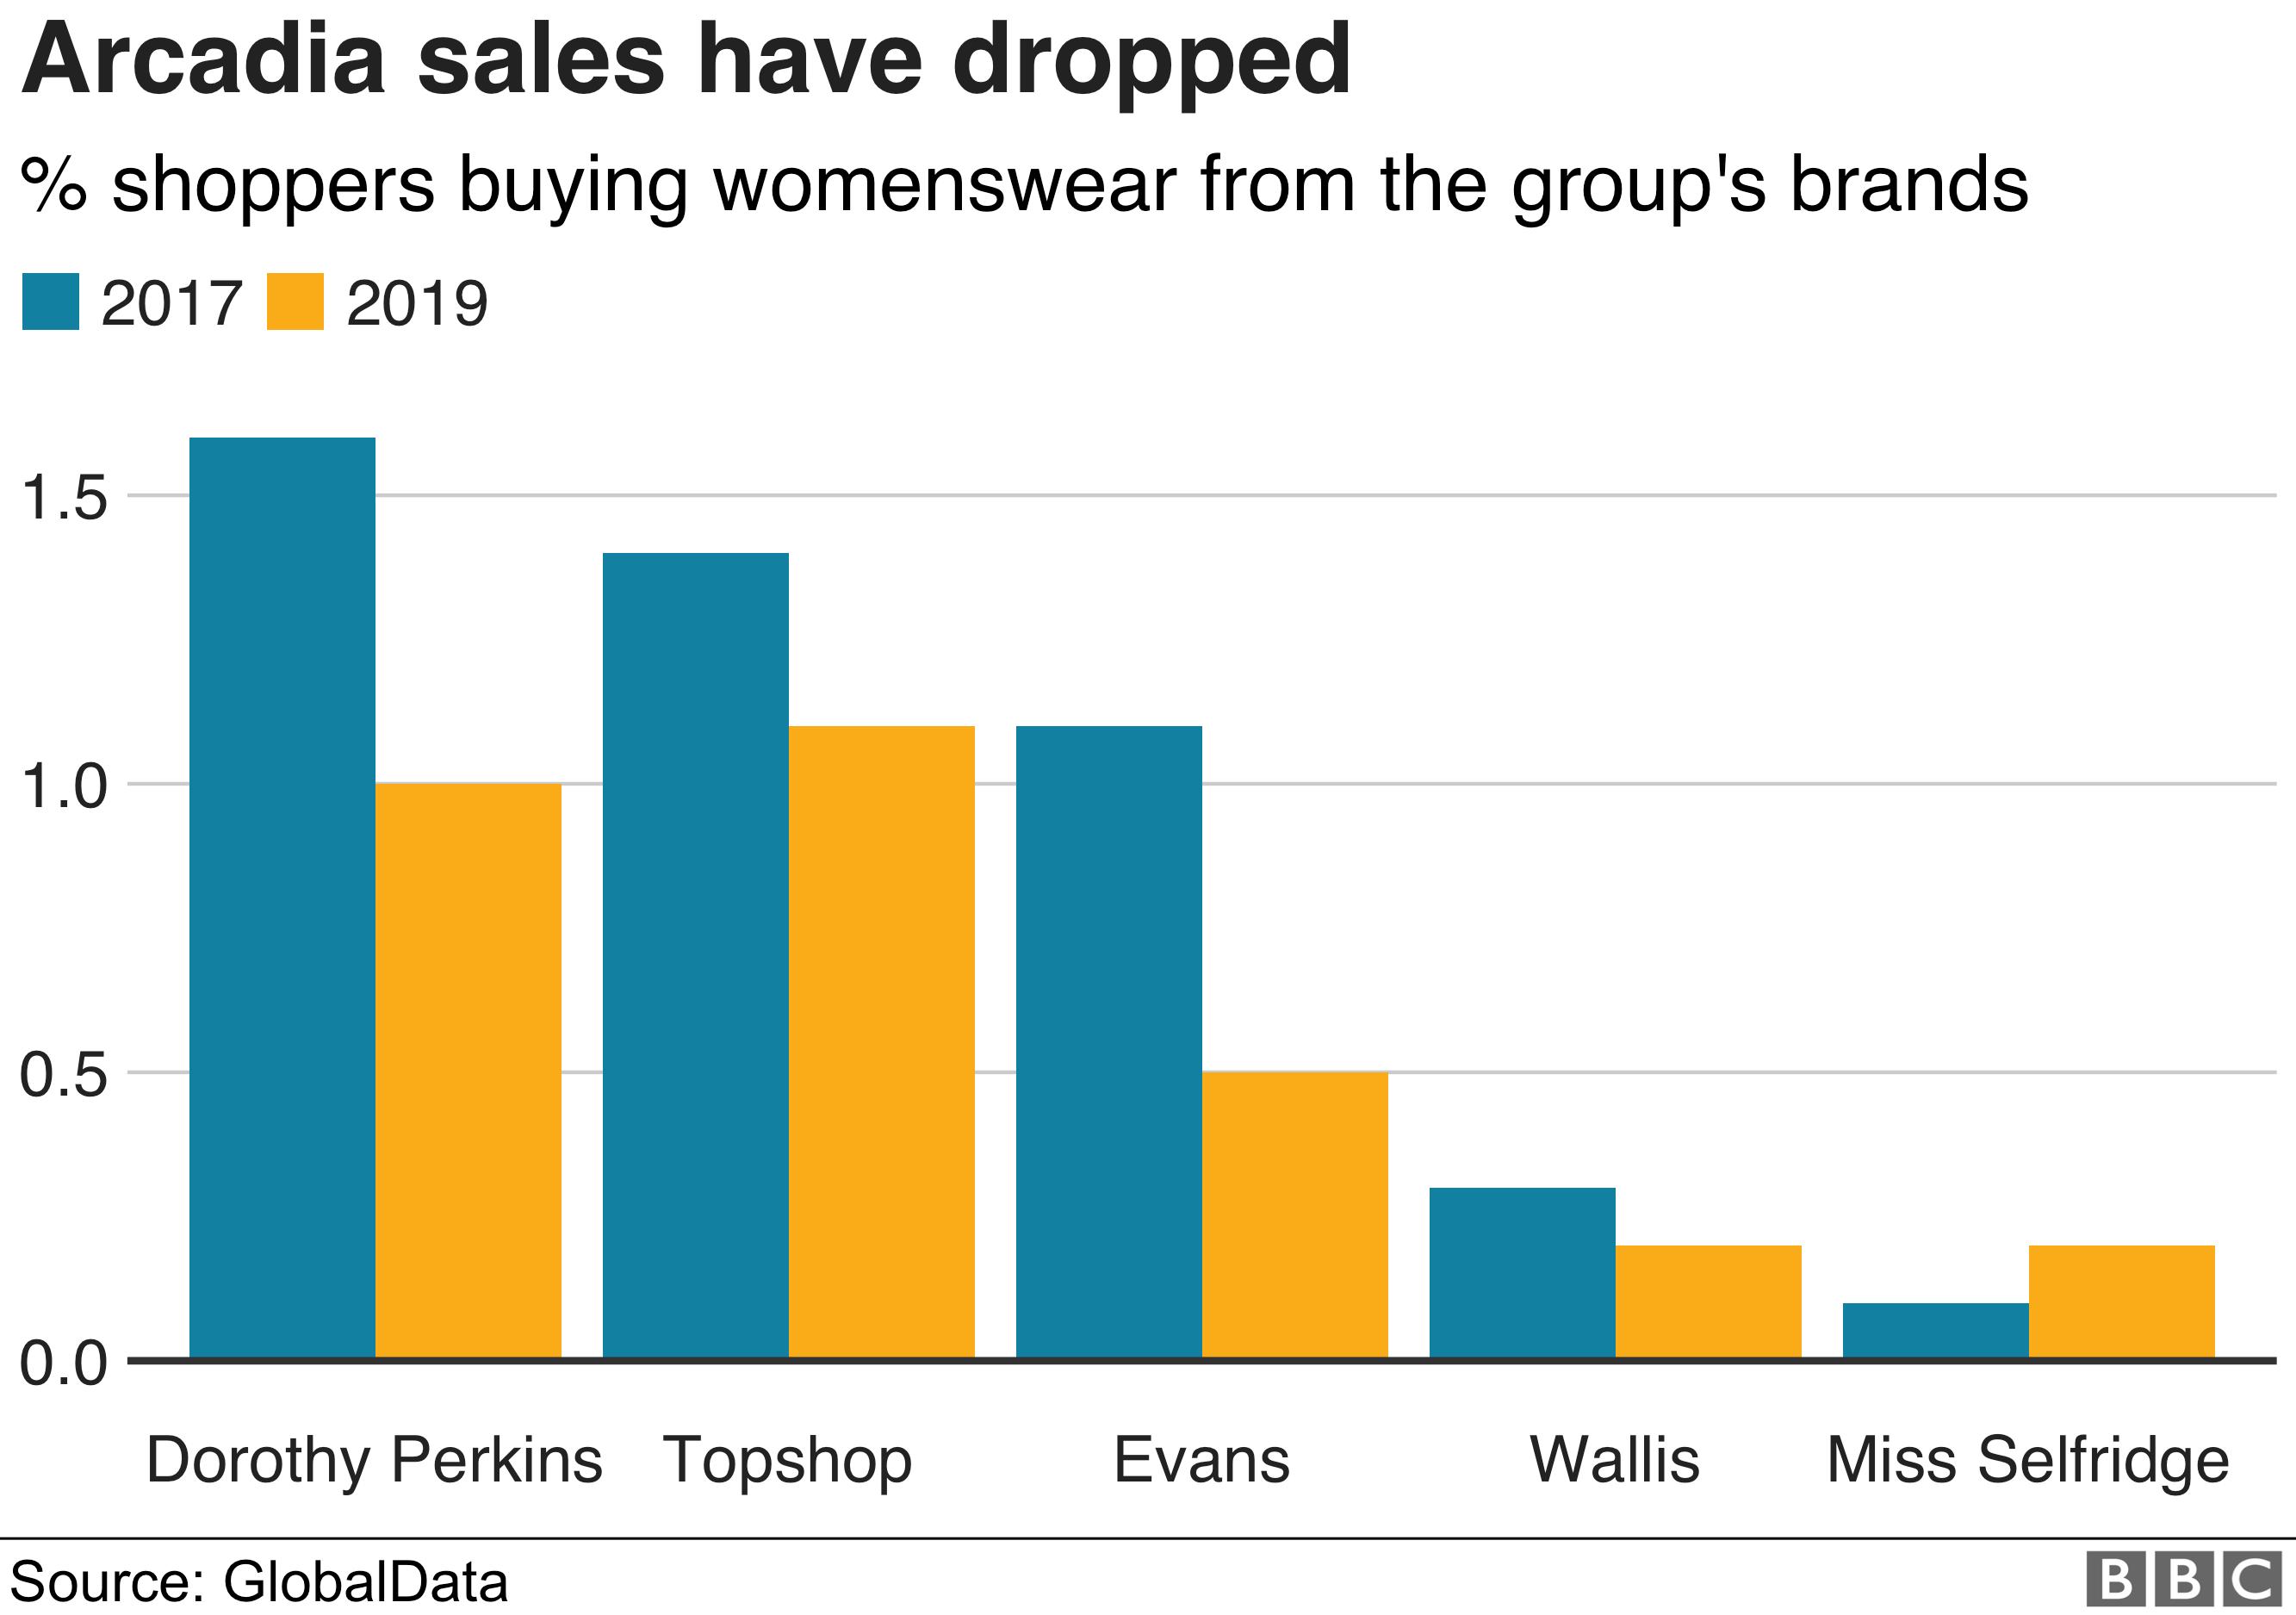 BBC chart on popularity of Arcadia brands